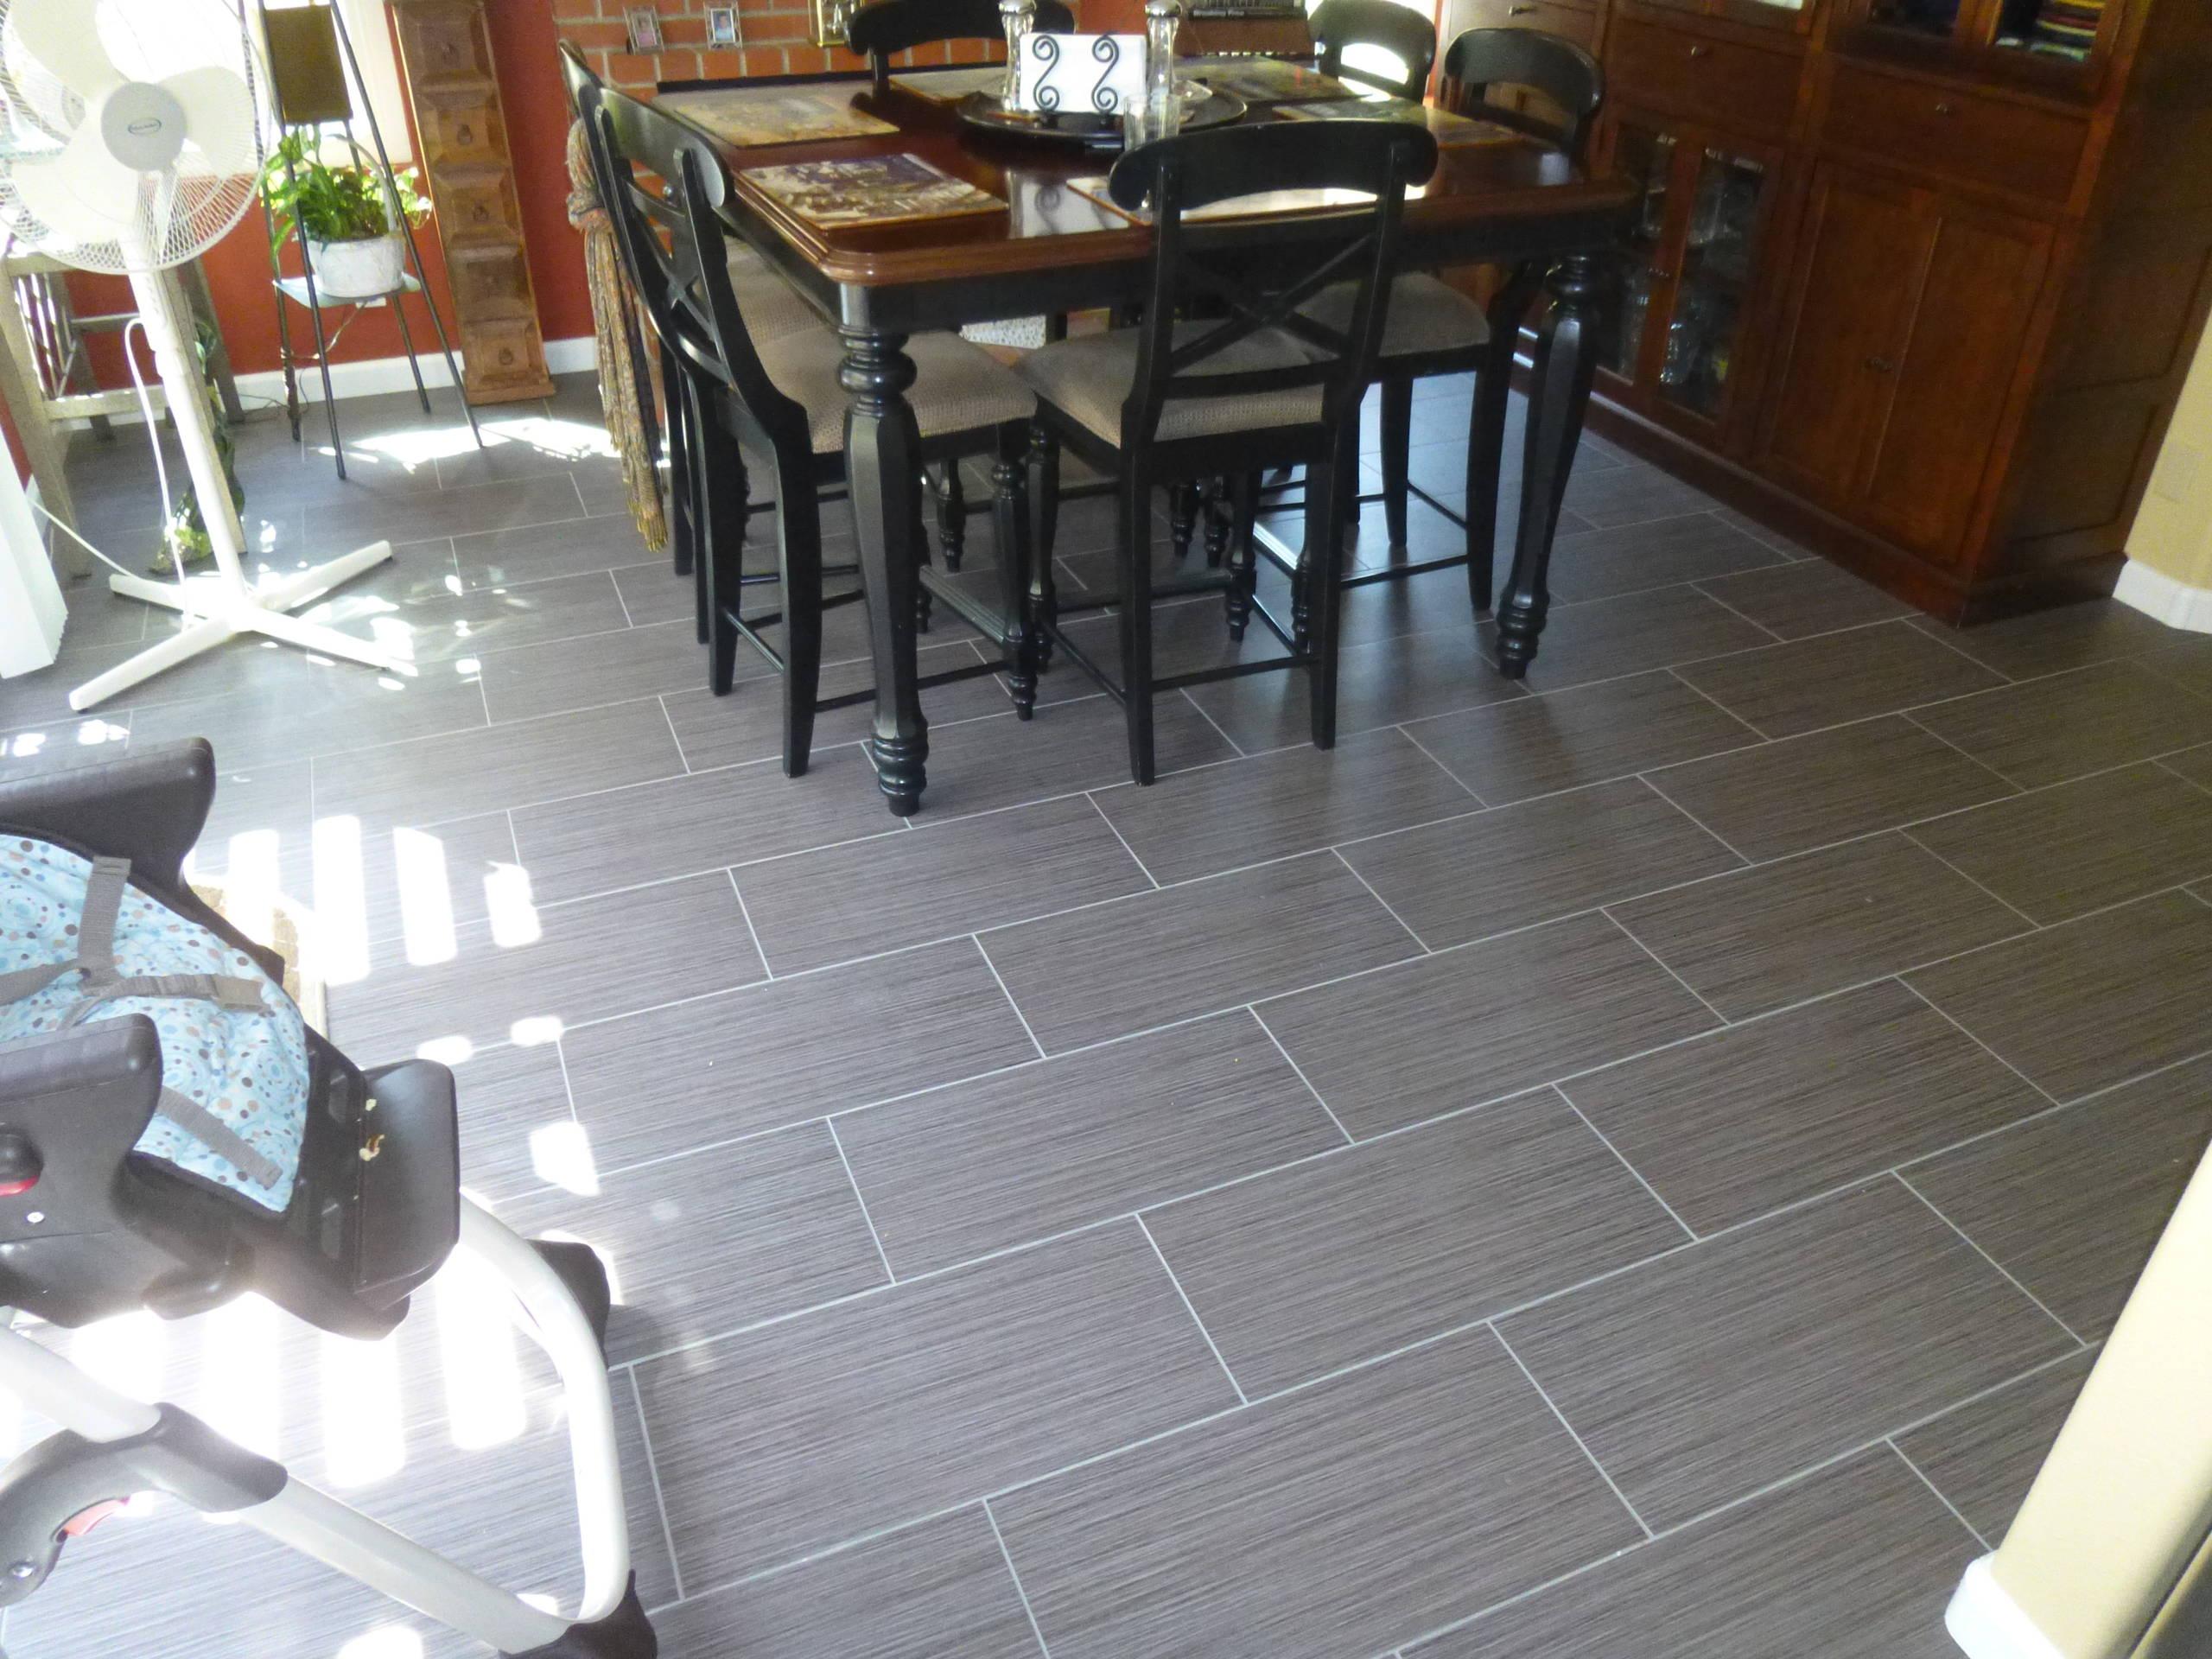 12 x 24 tile patterns ideas photos